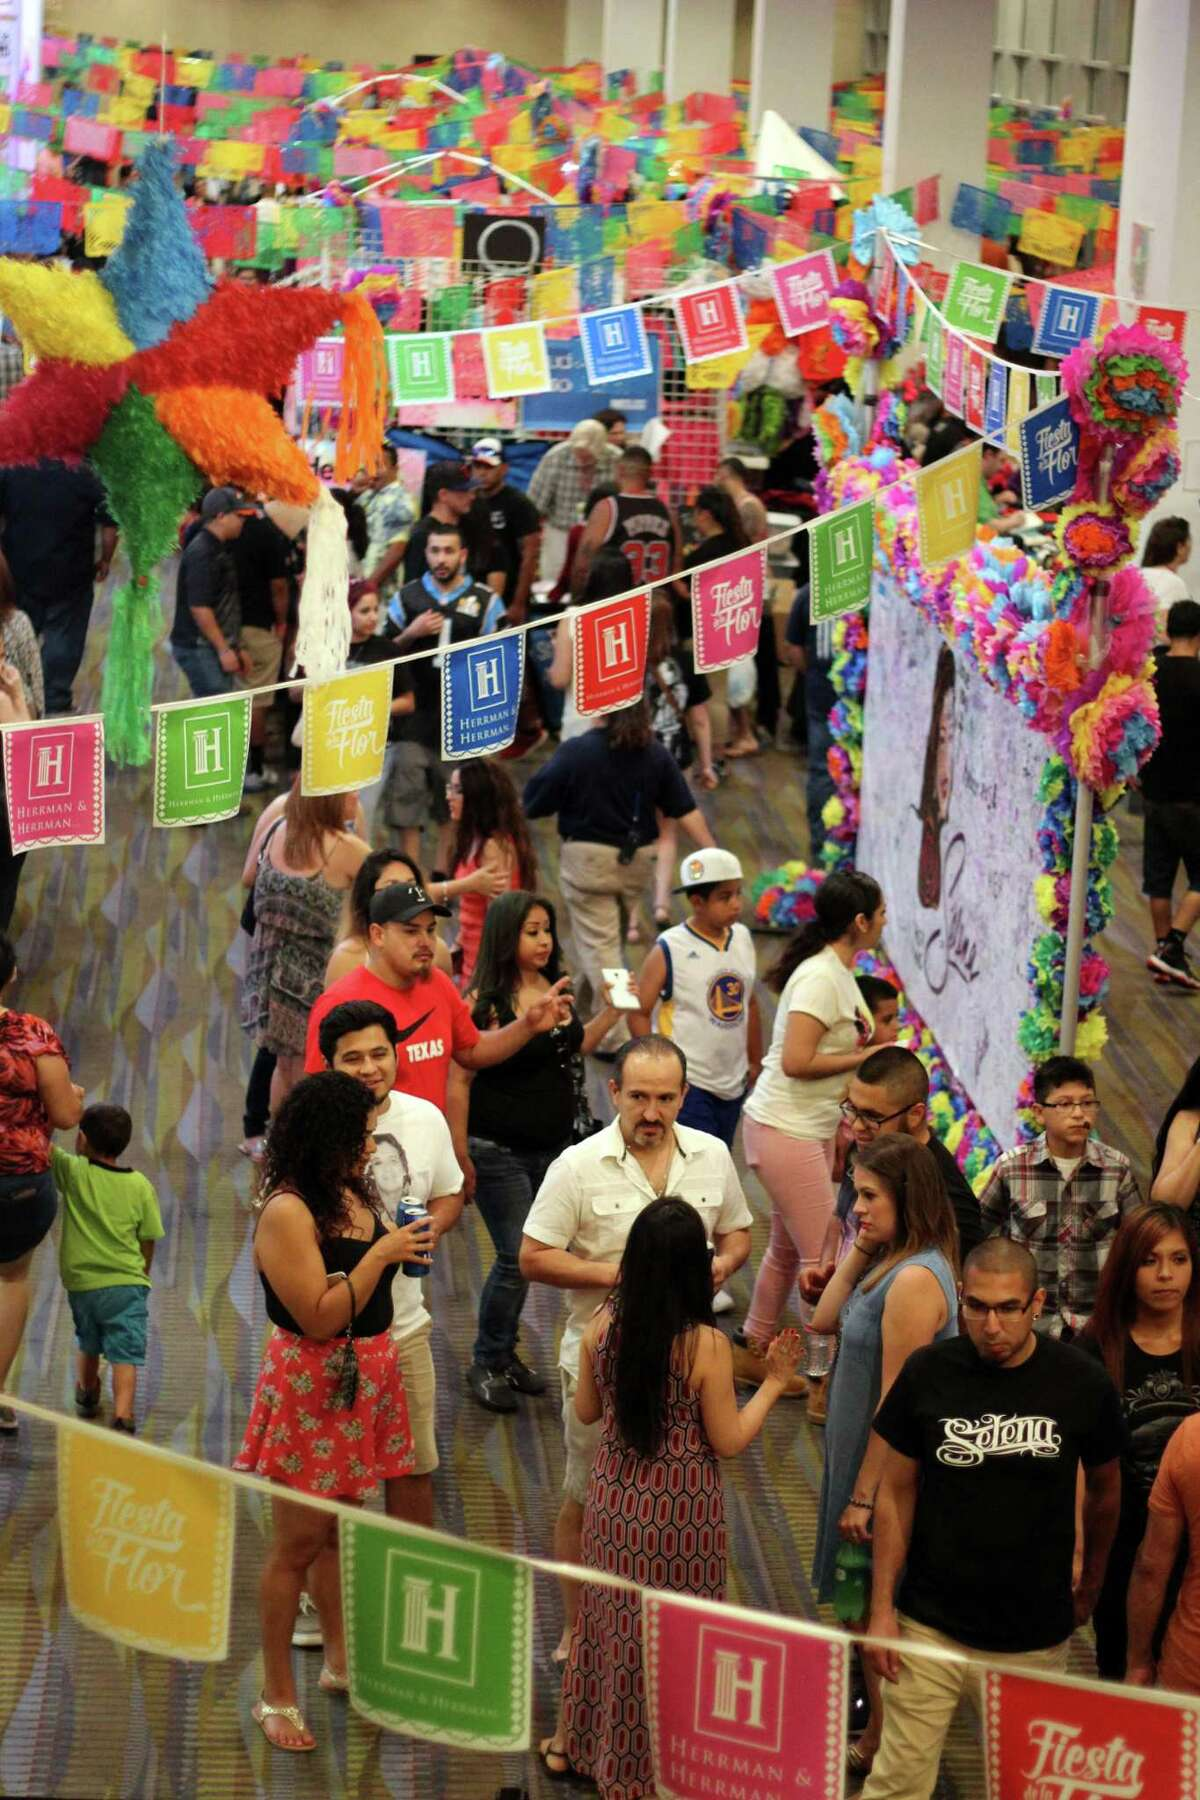 Houston jeweler Pamela McKinney will be debuting as a vendor at El Mercado, the shopping center at Fiesta de la Flor, the Corpus Christi festival honoring singer Selena Quintanilla.